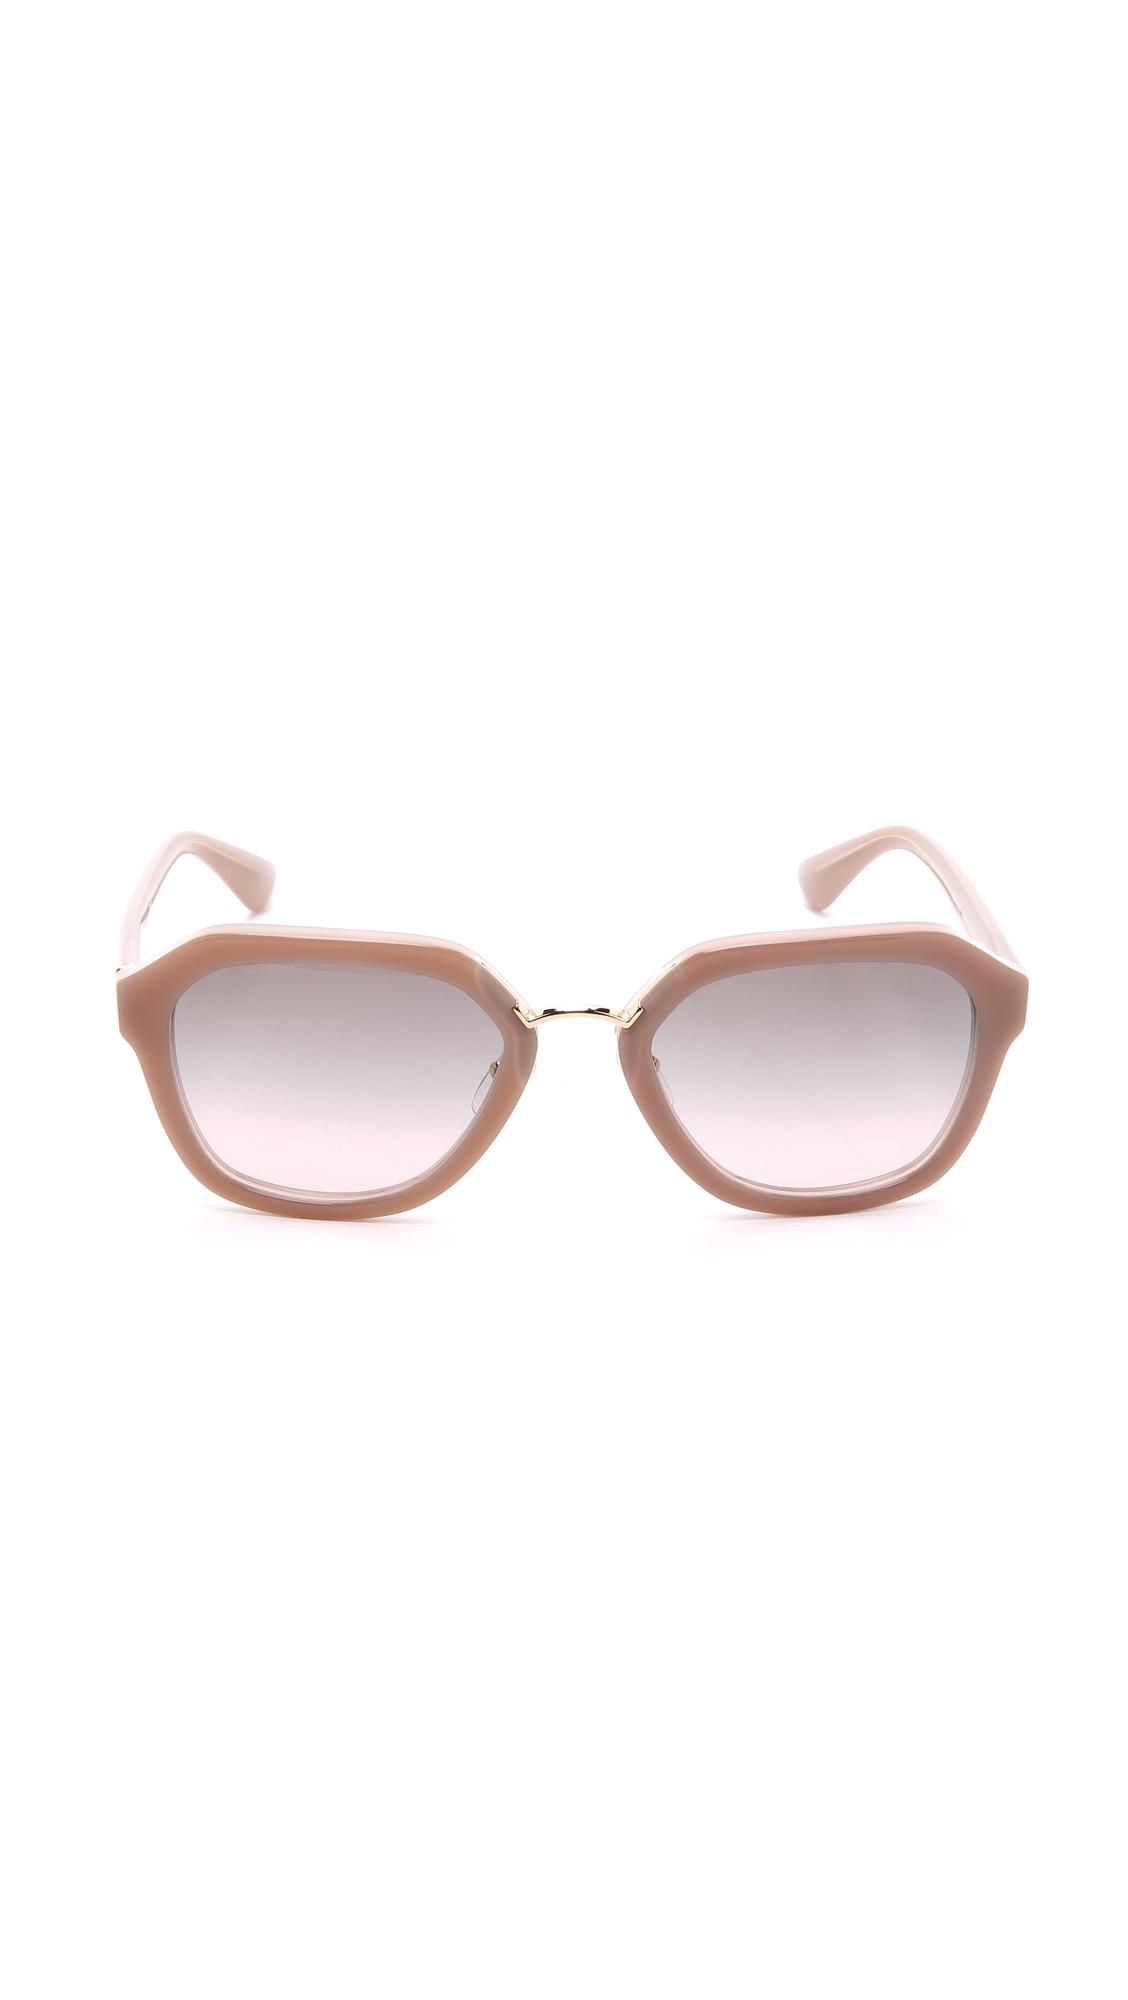 ad80ba10b97b1 ... discount prada metal bridge sunglasses opal powder pink pink grey in  natural lyst 14df1 23a3e